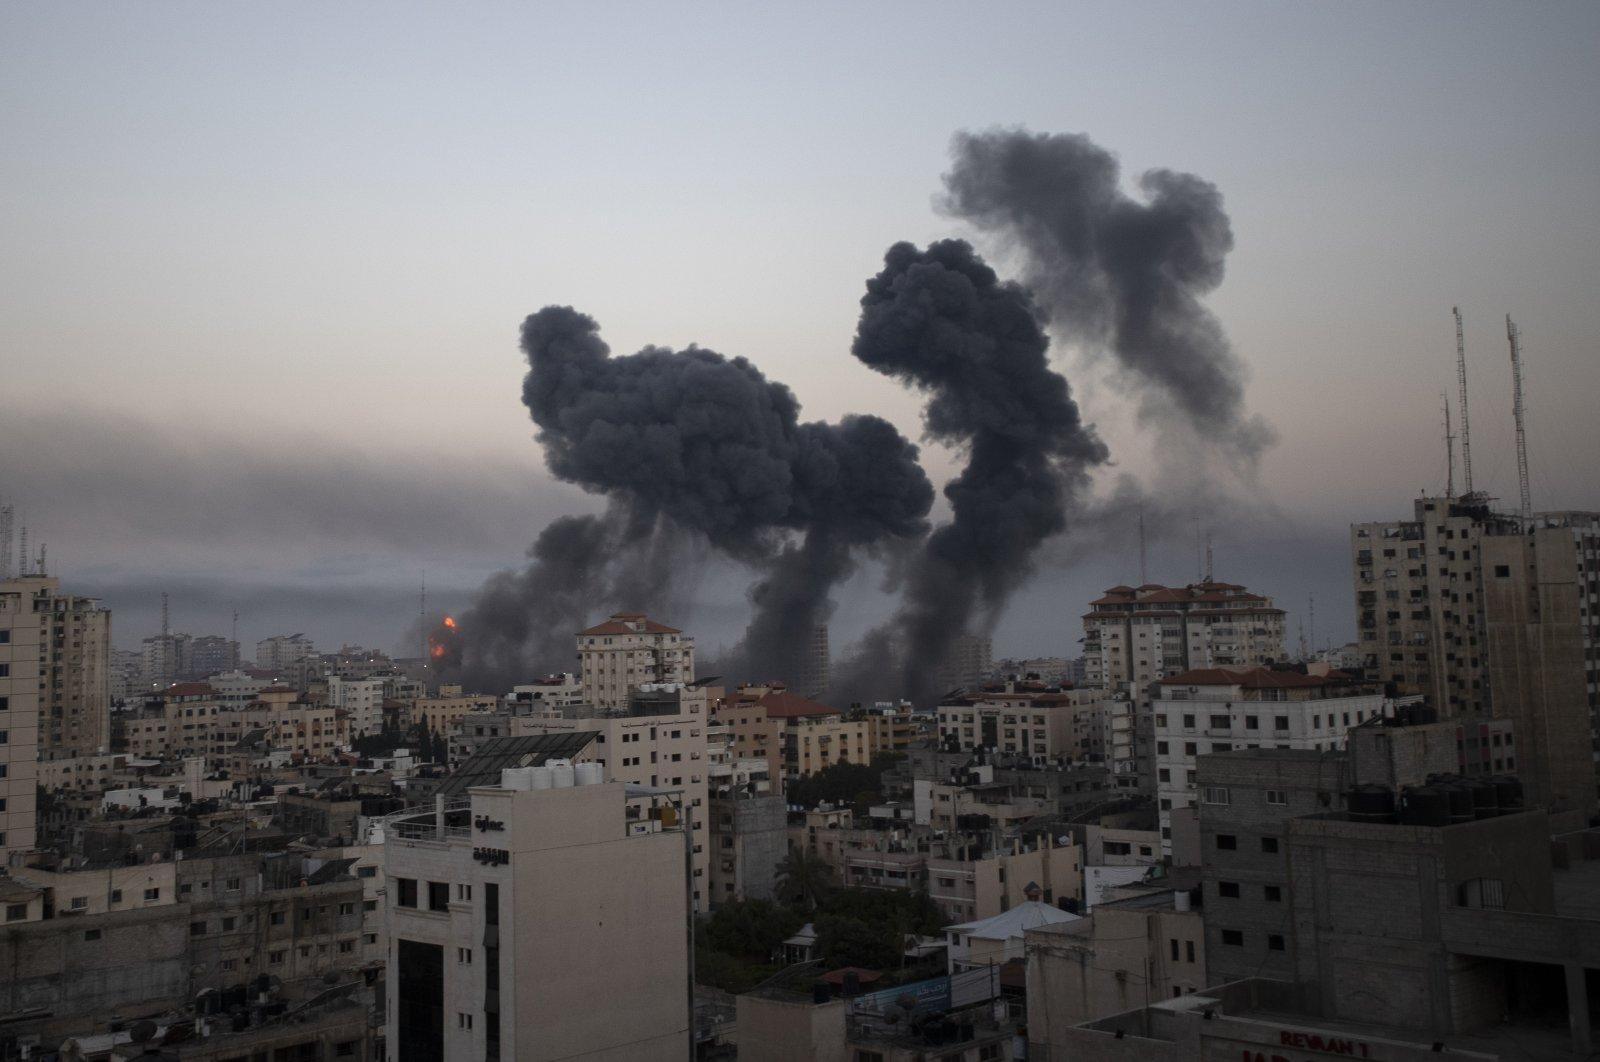 Smoke rises after Israeli airstrikes on Gaza City, the Gaza Strip, Palestine, Wednesday, May 12, 2021.(AP Photo)